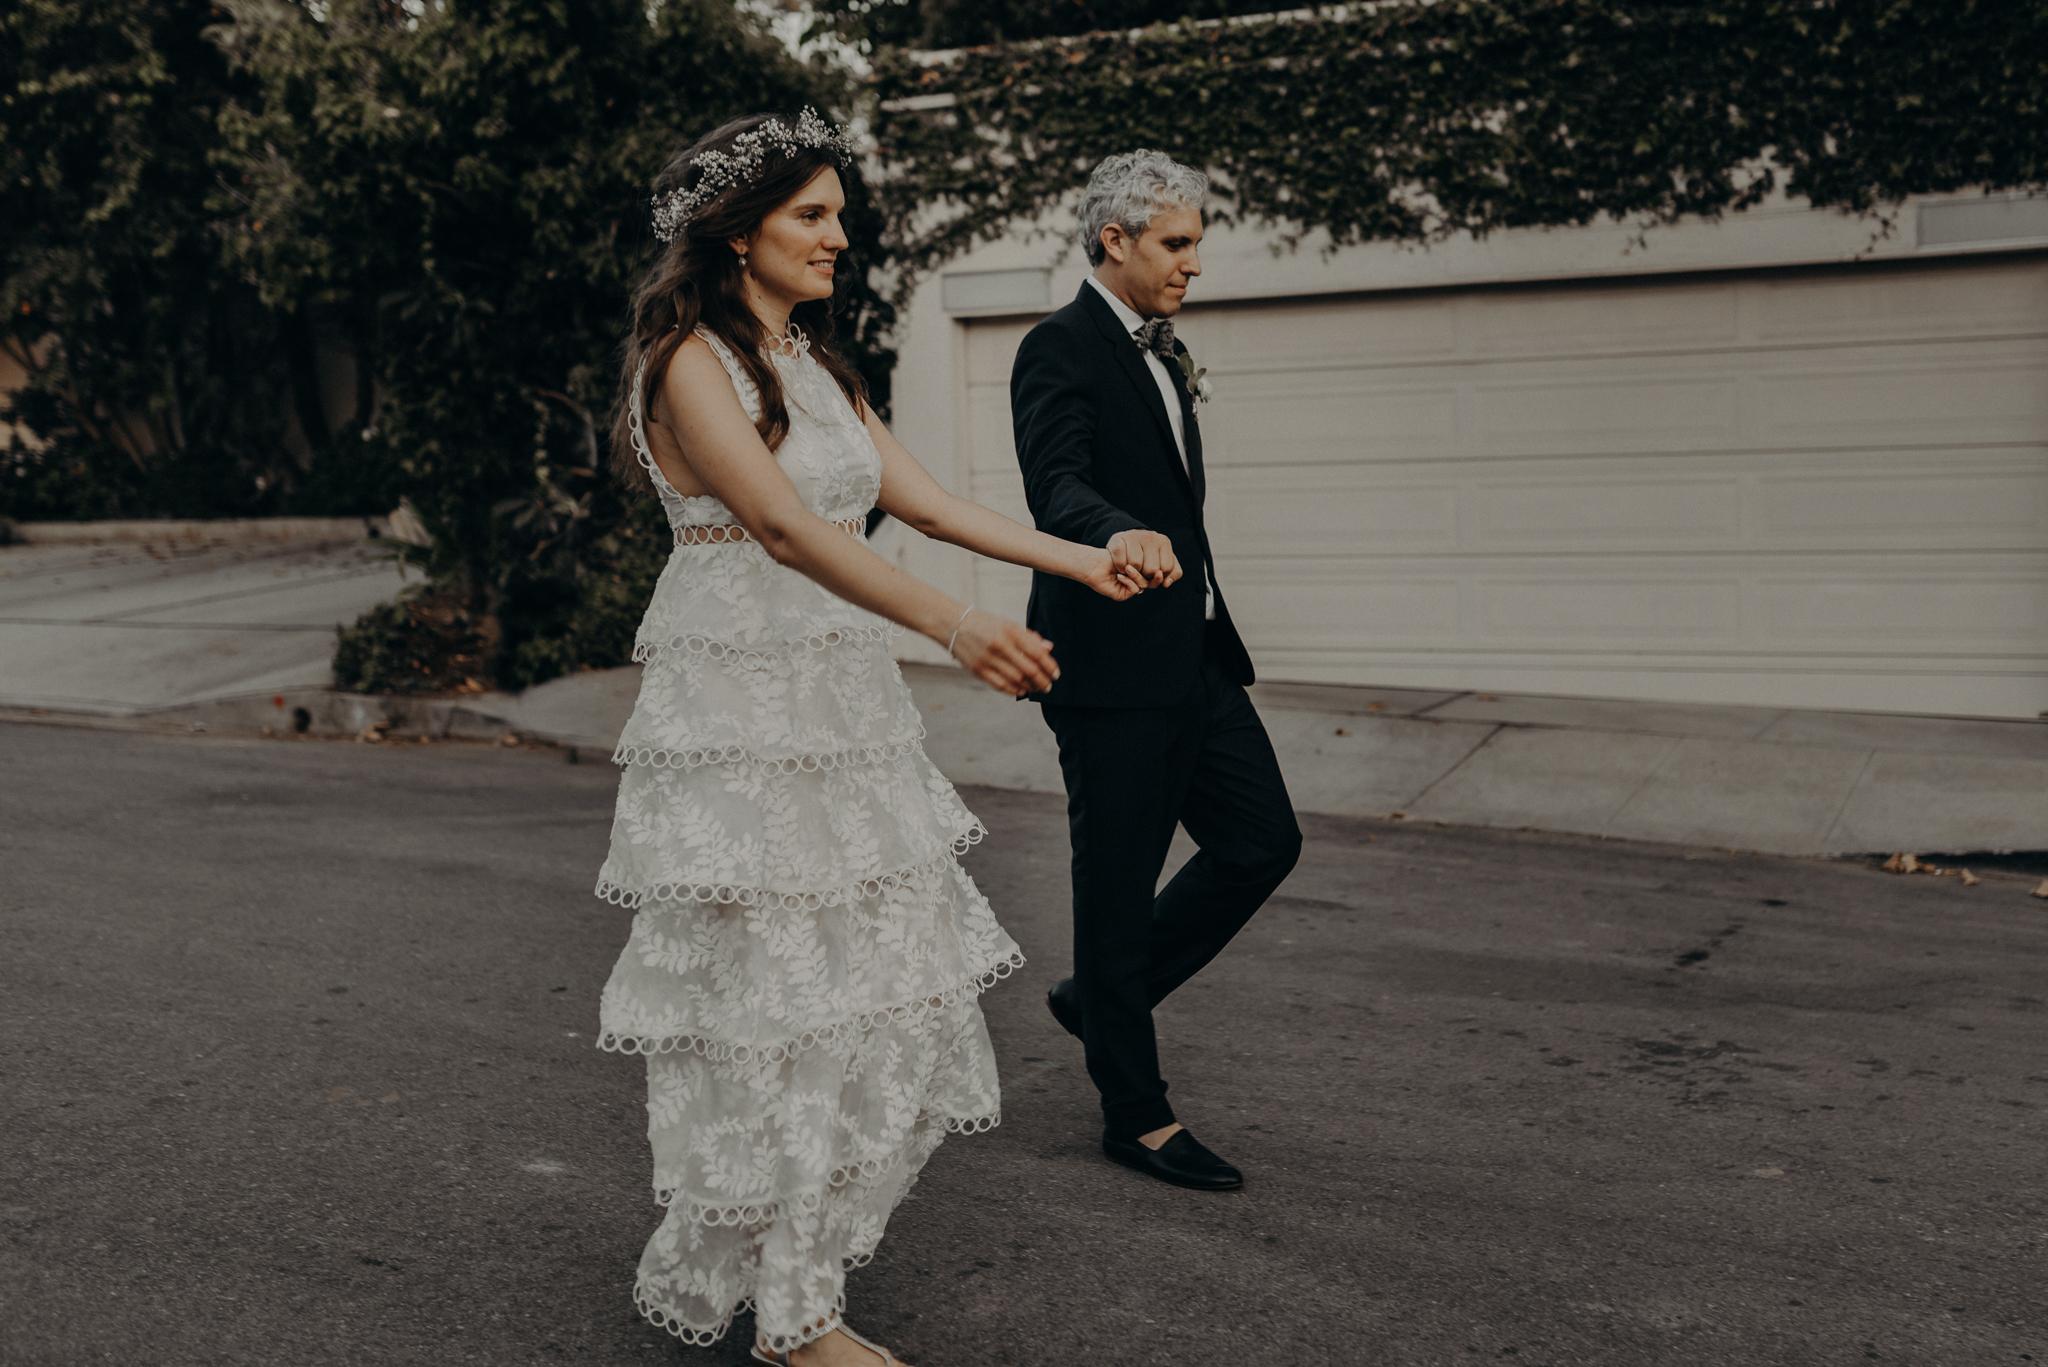 Isaiah + Taylor Photography - Private Estate Backyard Wedding - Beverly Hills - Los Angeles Wedding Photographer - 113.jpg